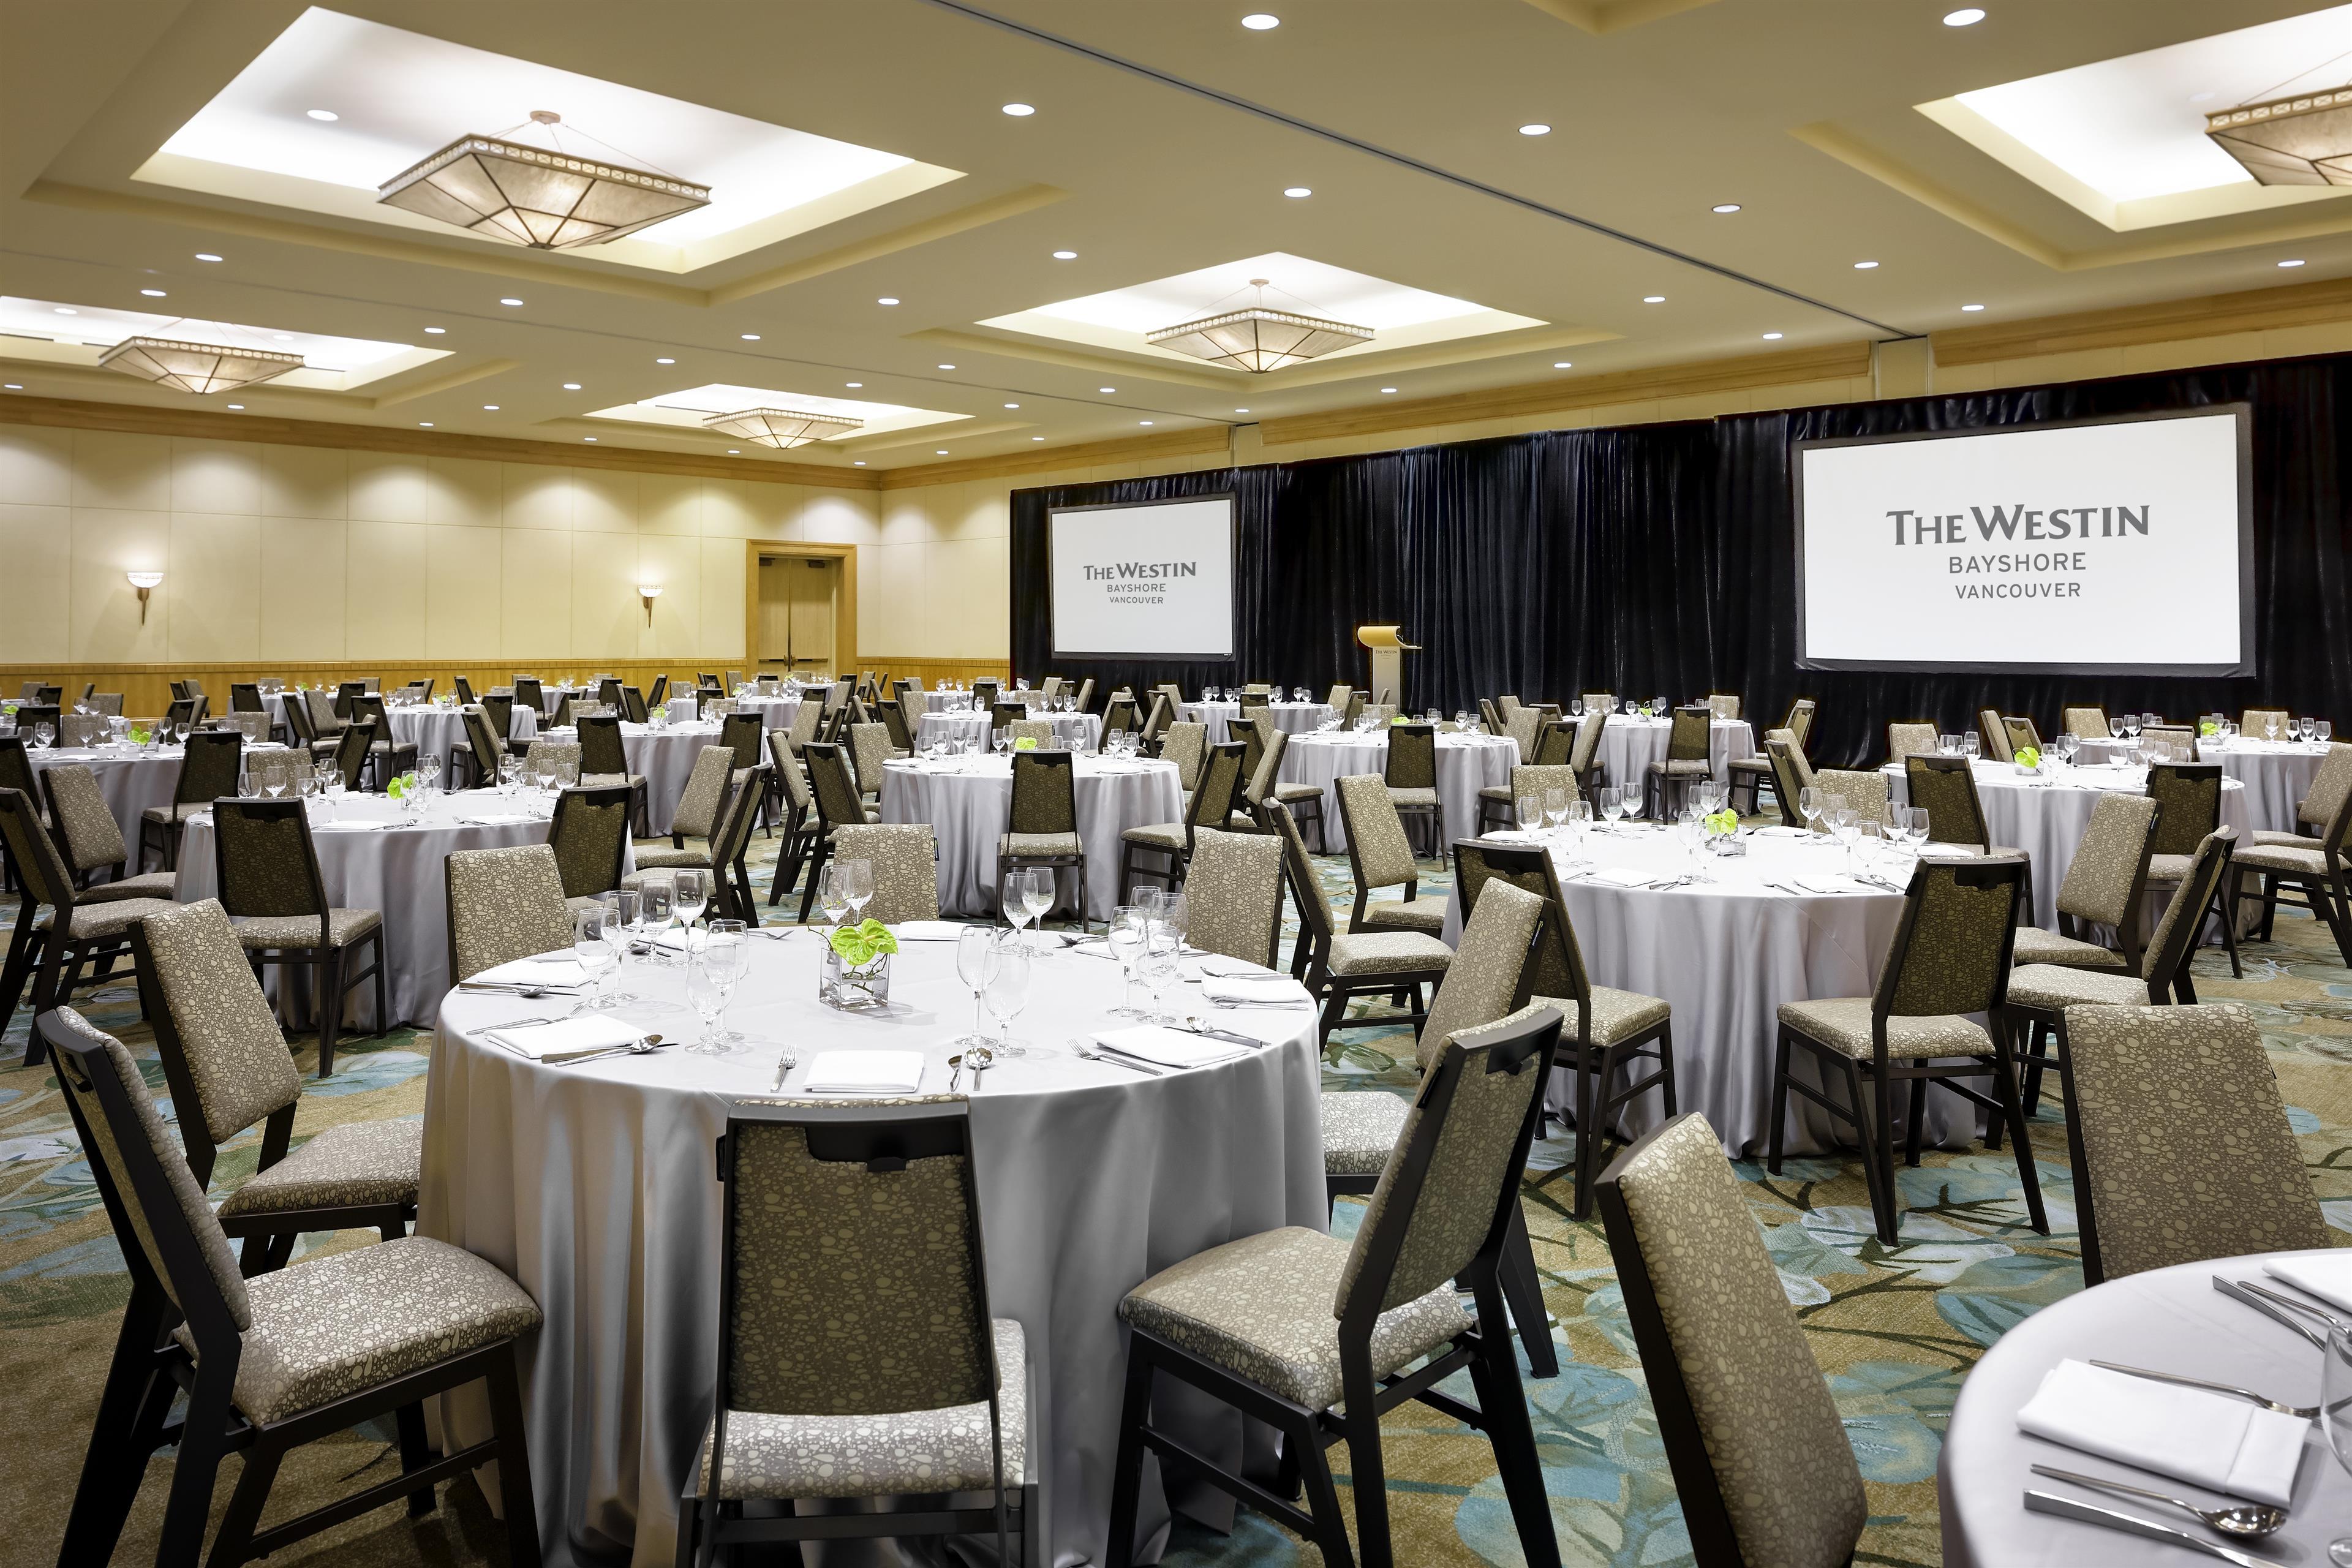 The Westin Bayshore, Vancouver in Vancouver: Stanley Park Ballroom Banquet